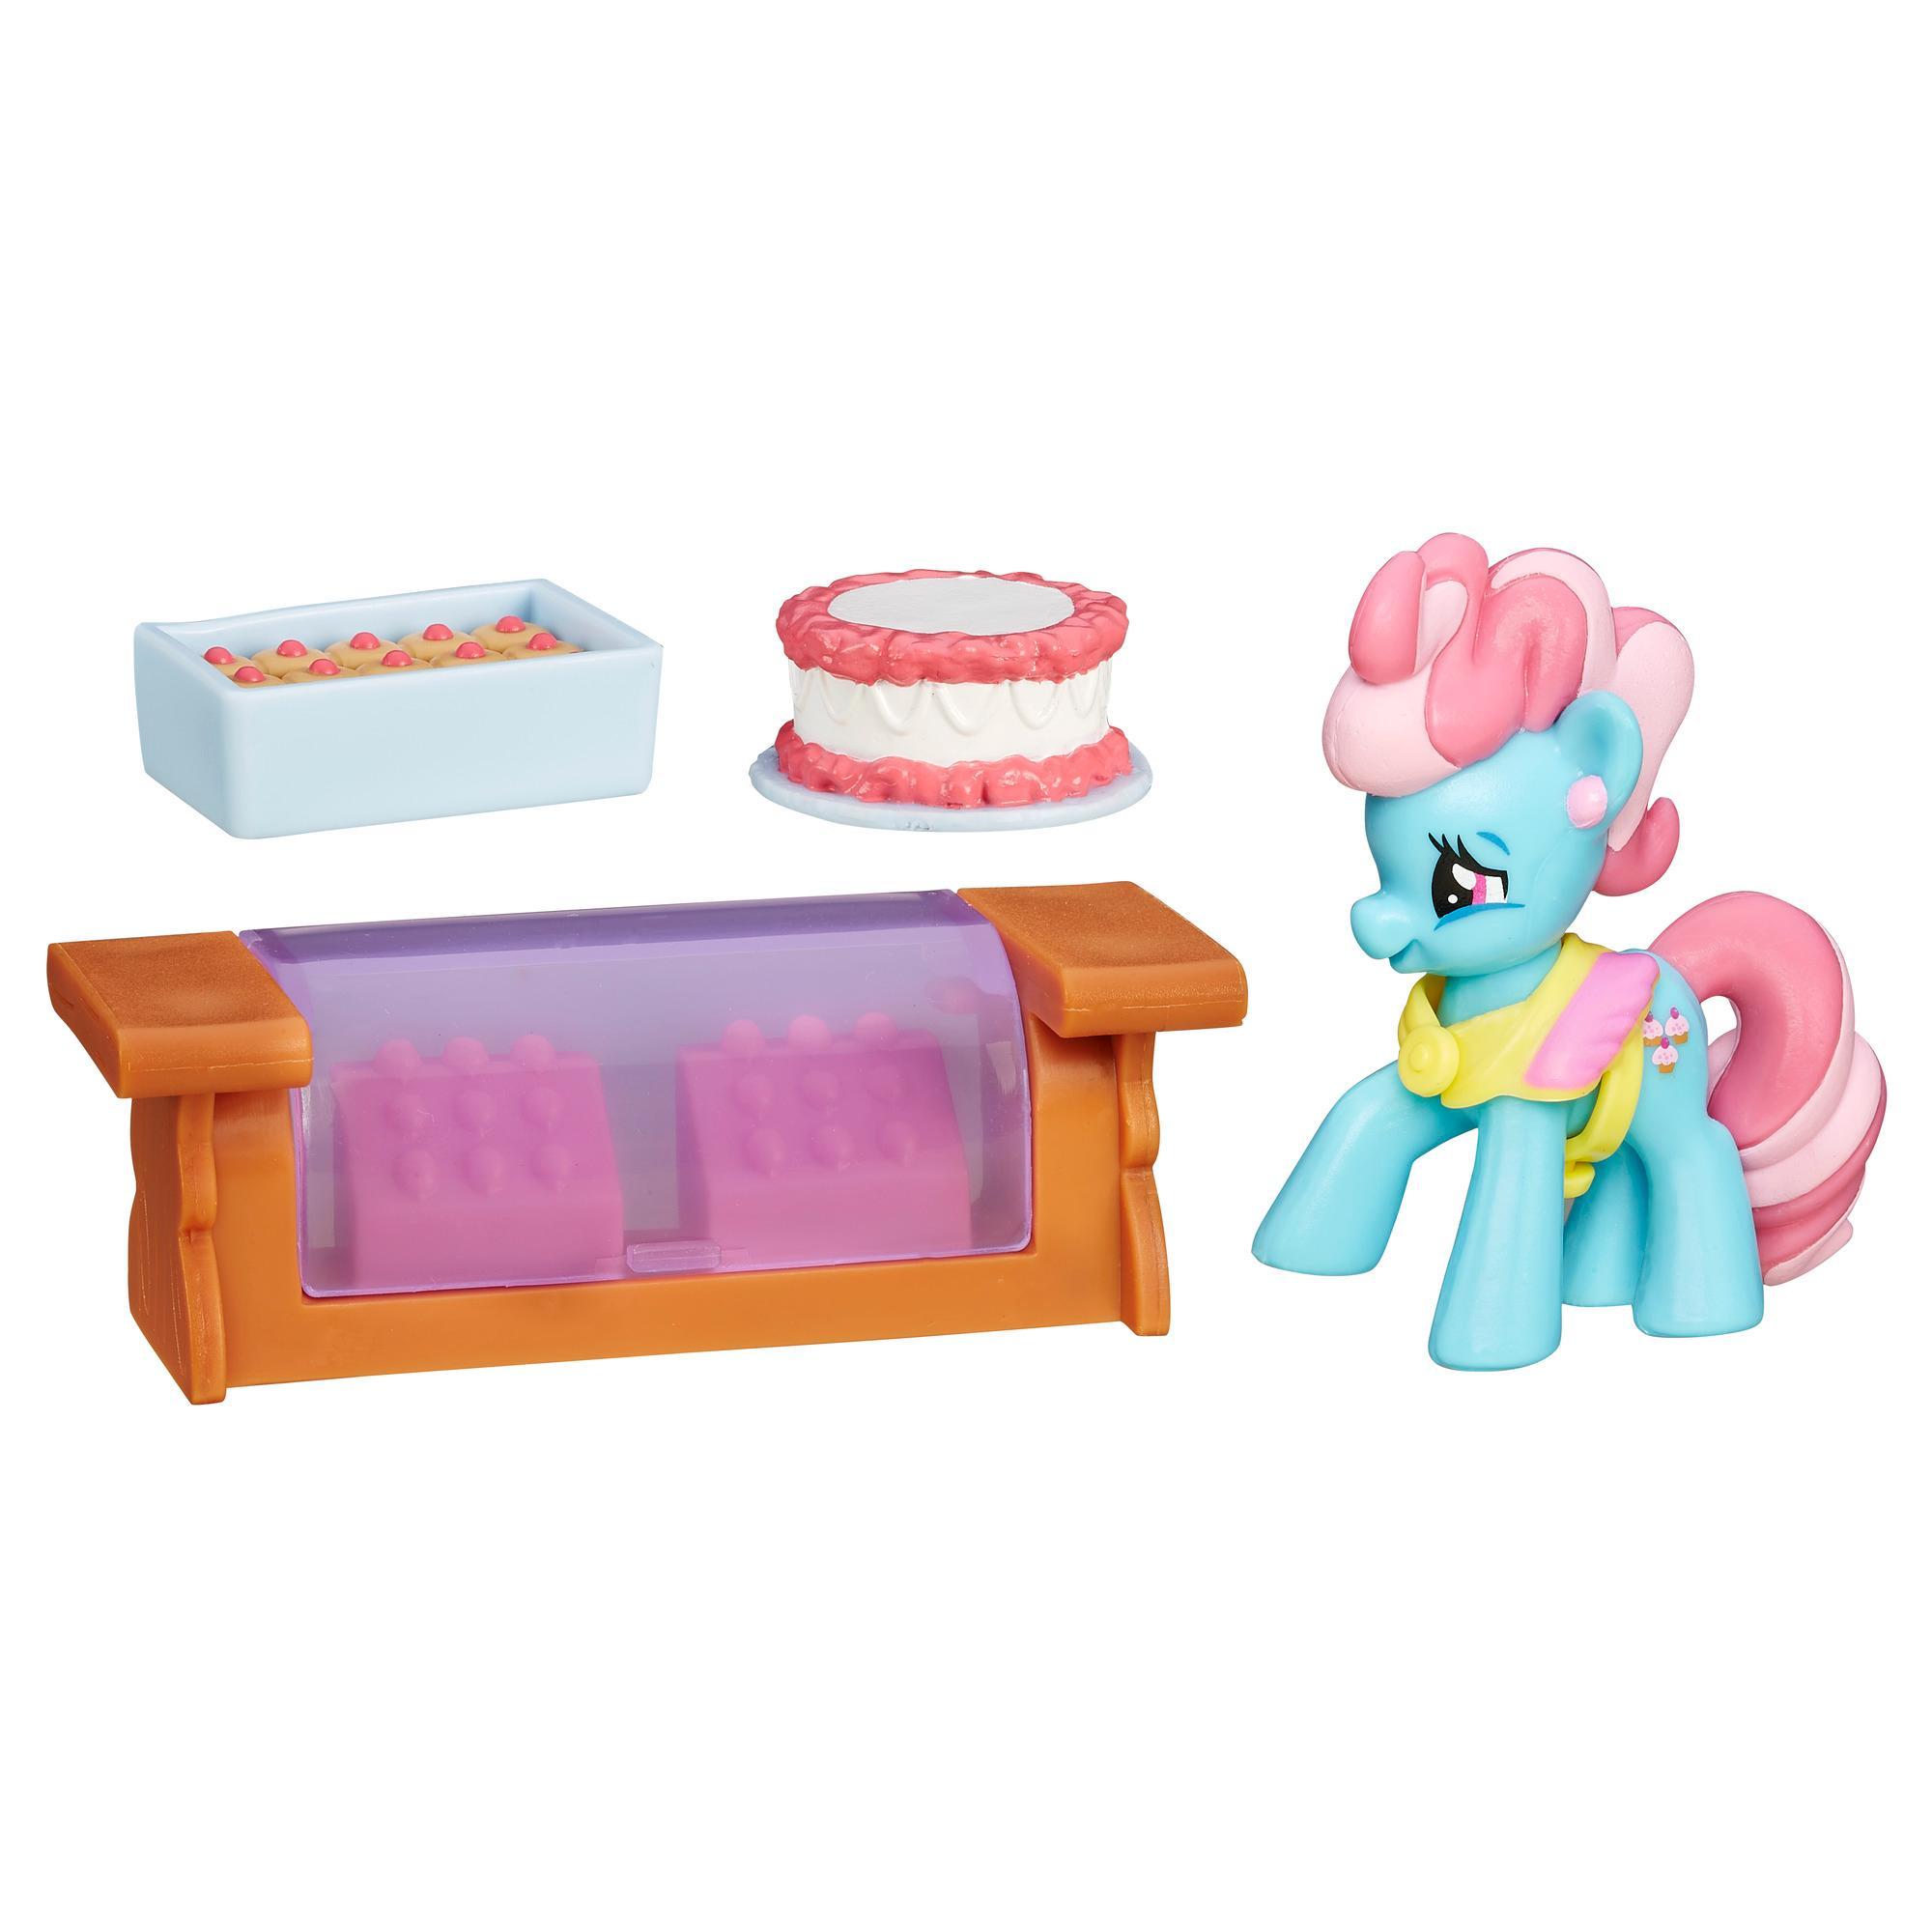 Figura My Little Pony com acessório.